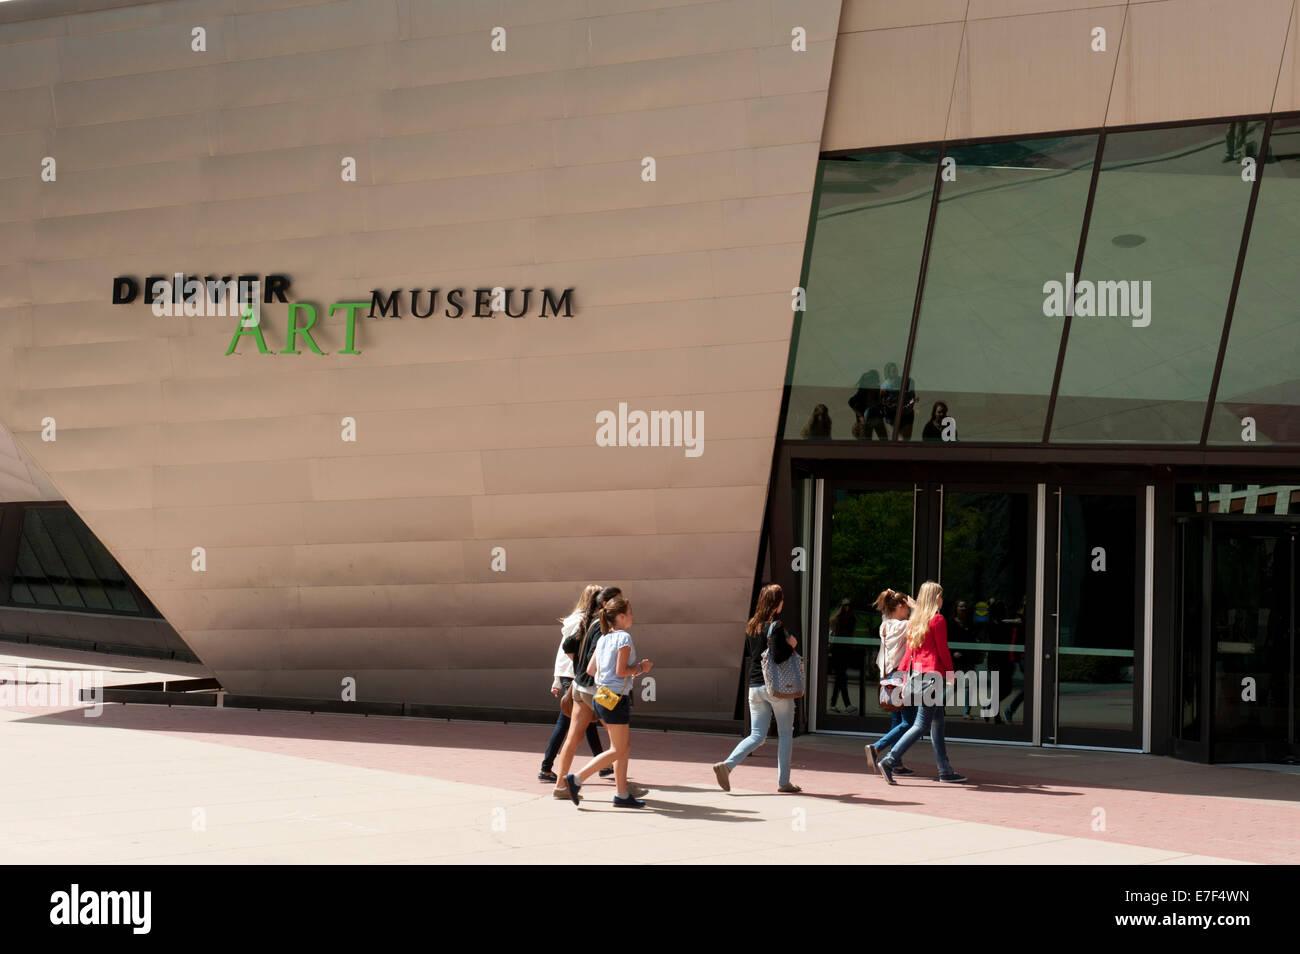 Denver Art Museum, Hamilton Building, young woman at the entrance, Denver, Colorado, USA - Stock Image